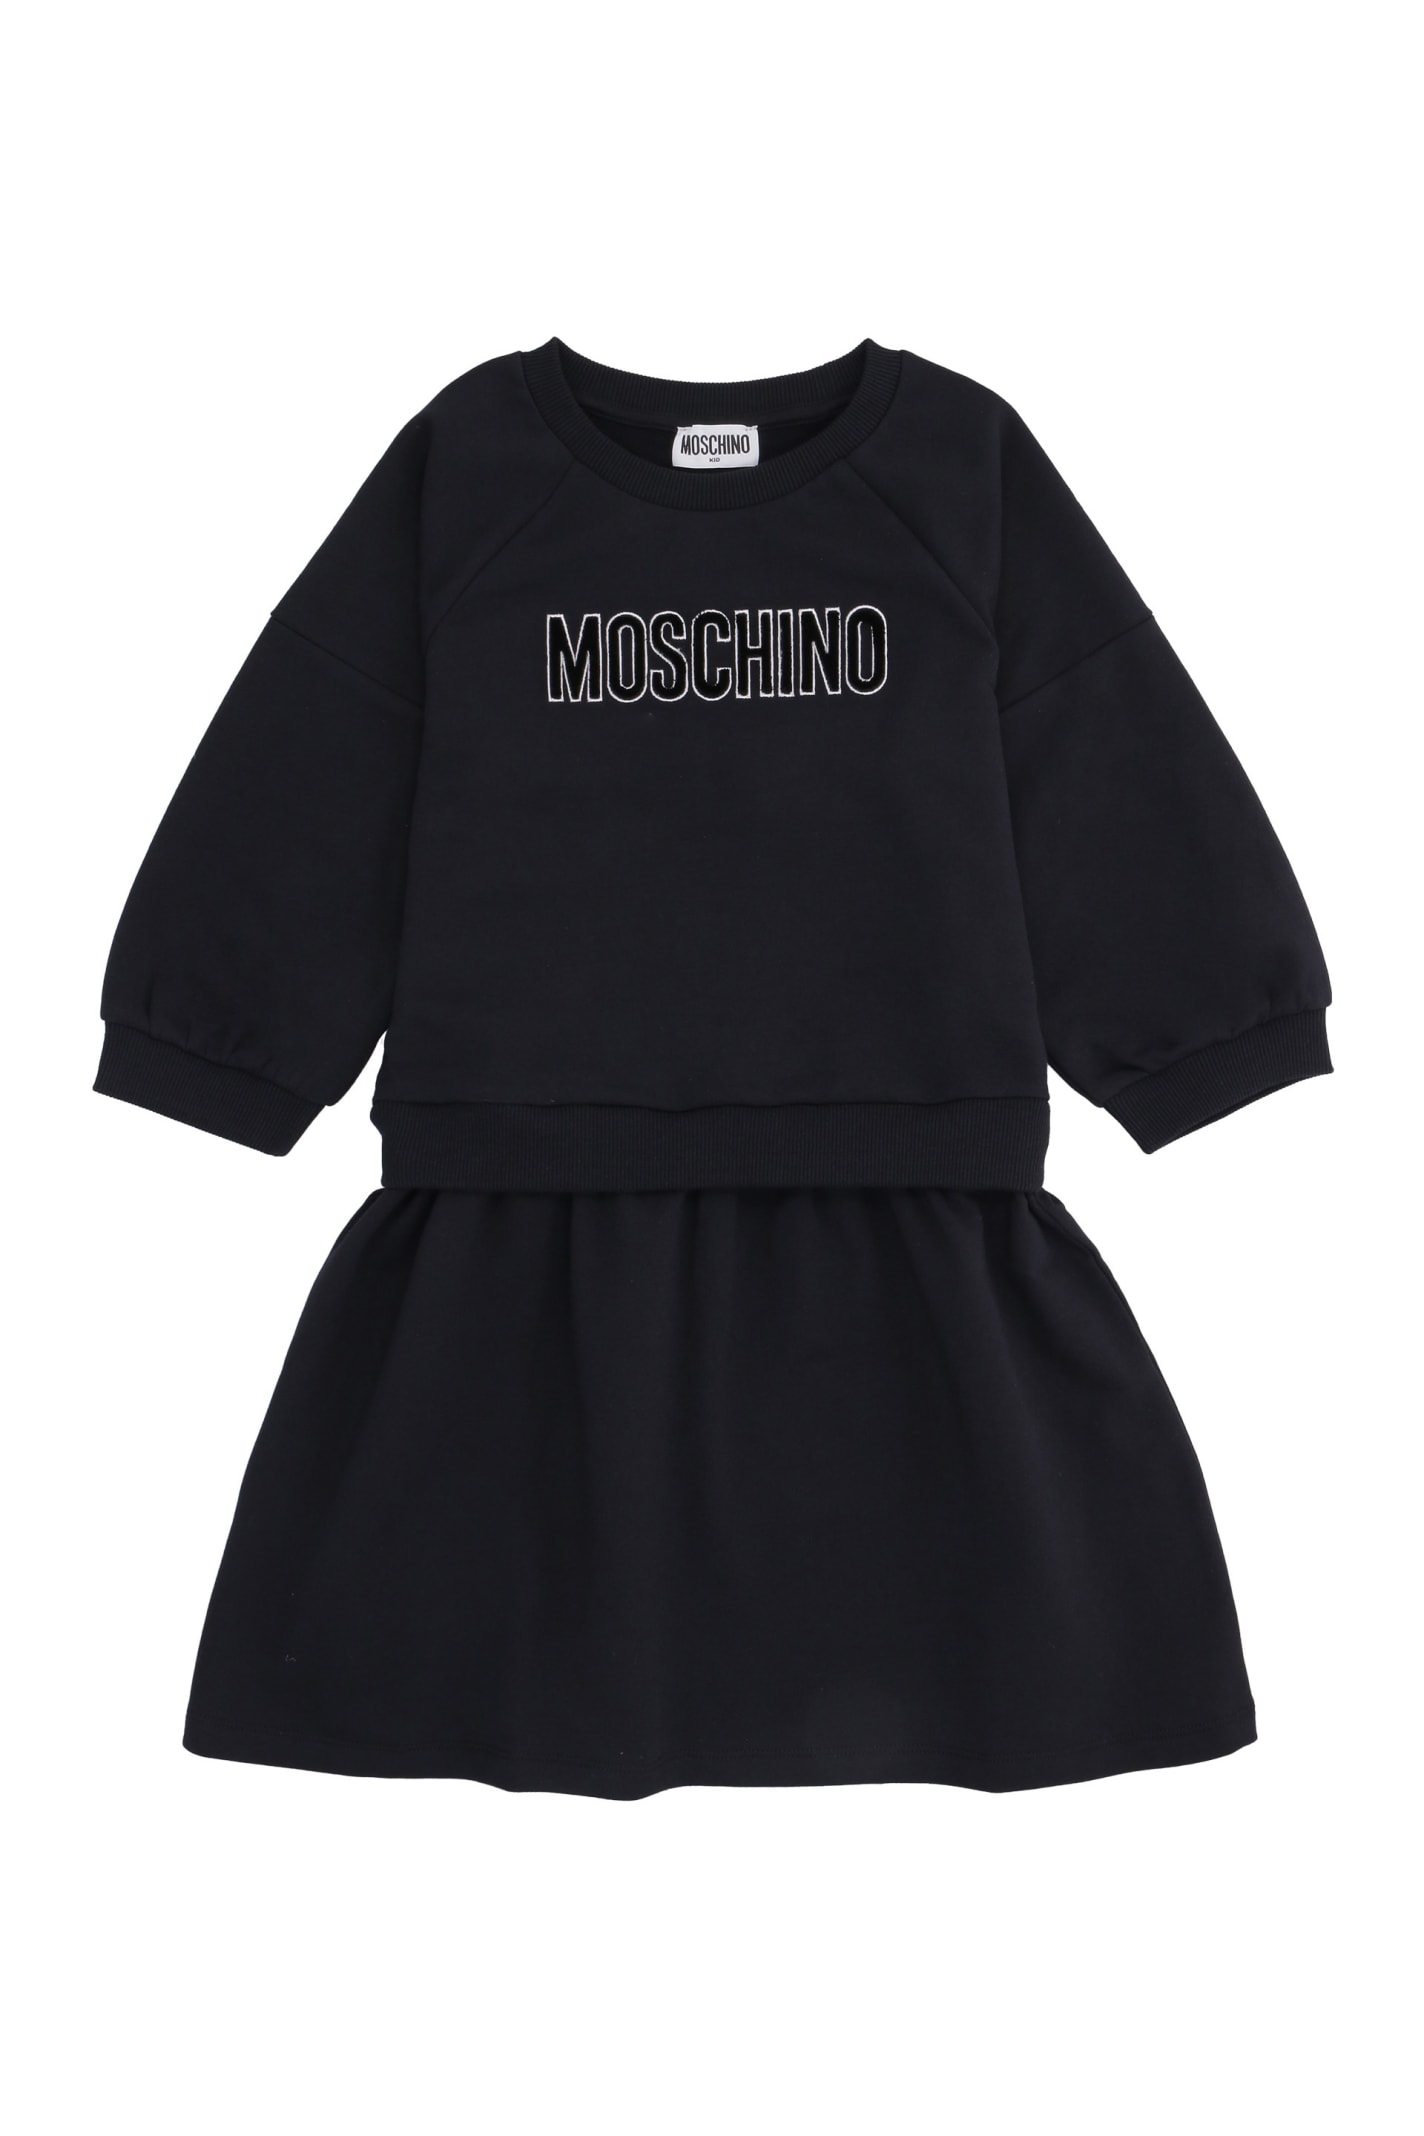 Moschino Logo Print Long Sleeve Dress